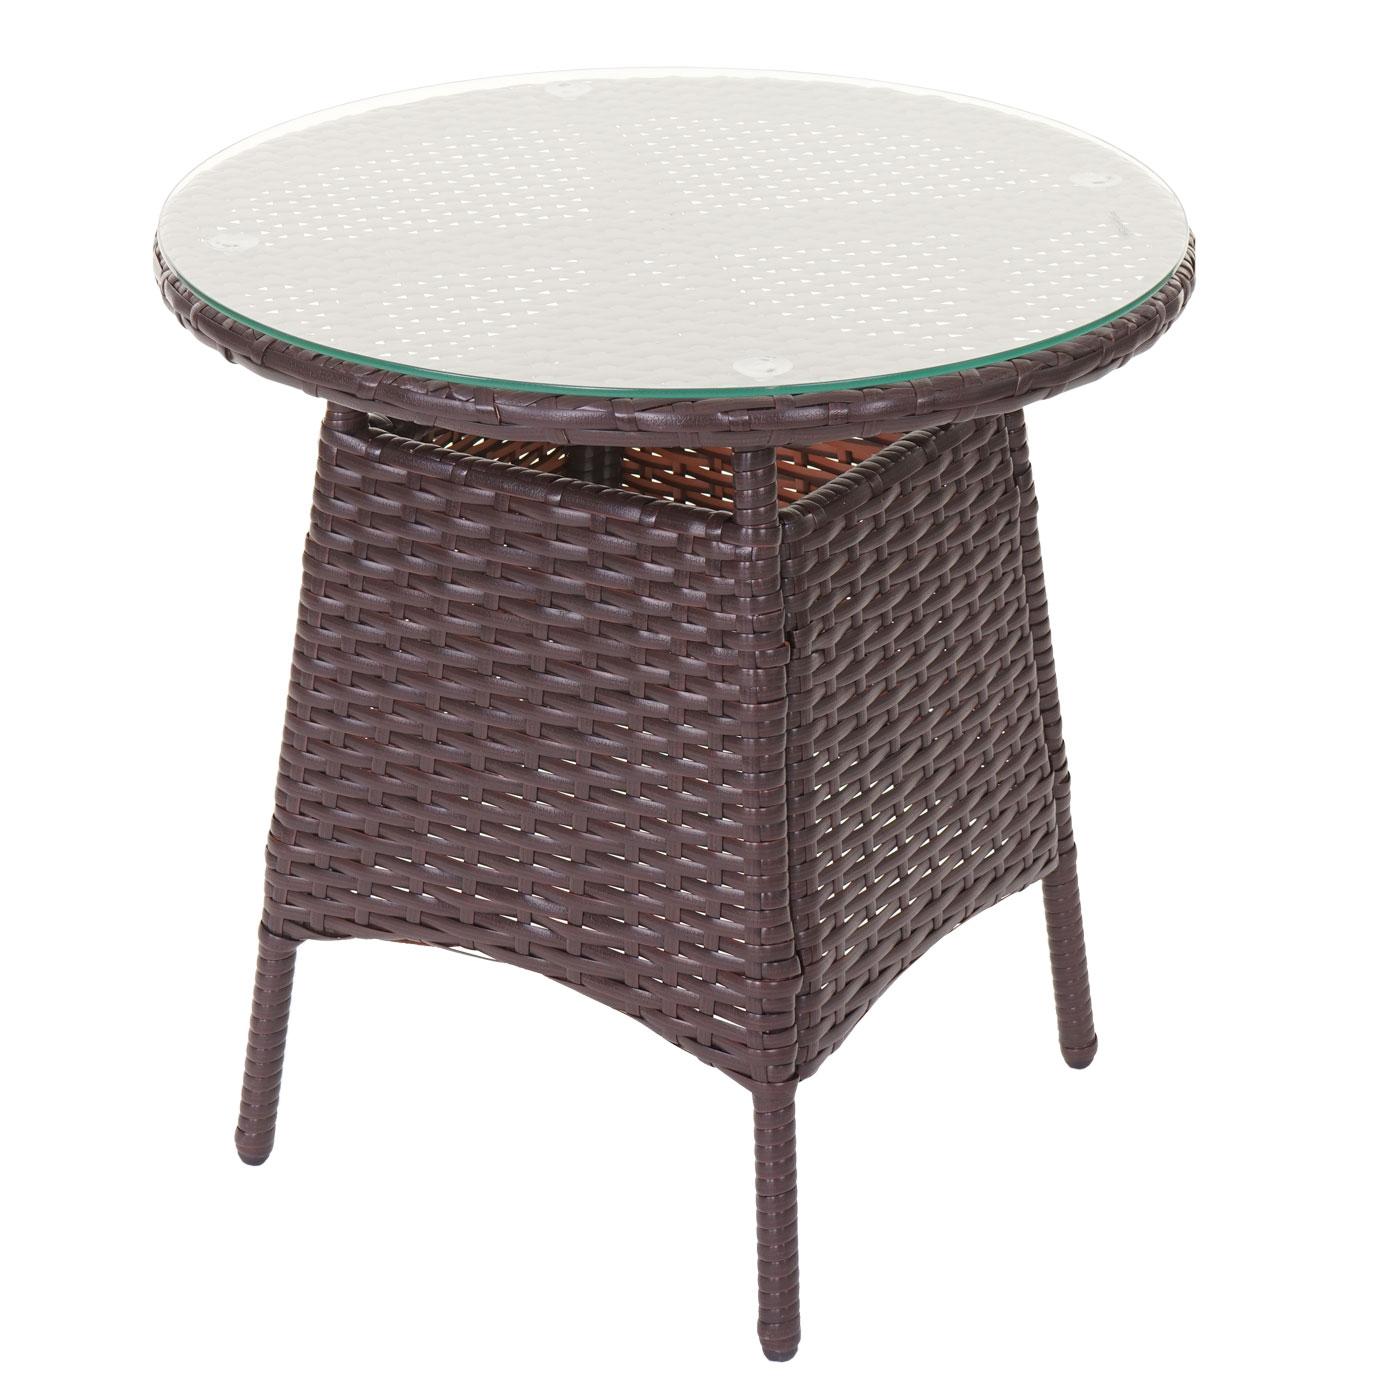 poly rattan garnitur hwc a82 balkon set gartenm bel sitzgarnitur braun kissen creme. Black Bedroom Furniture Sets. Home Design Ideas